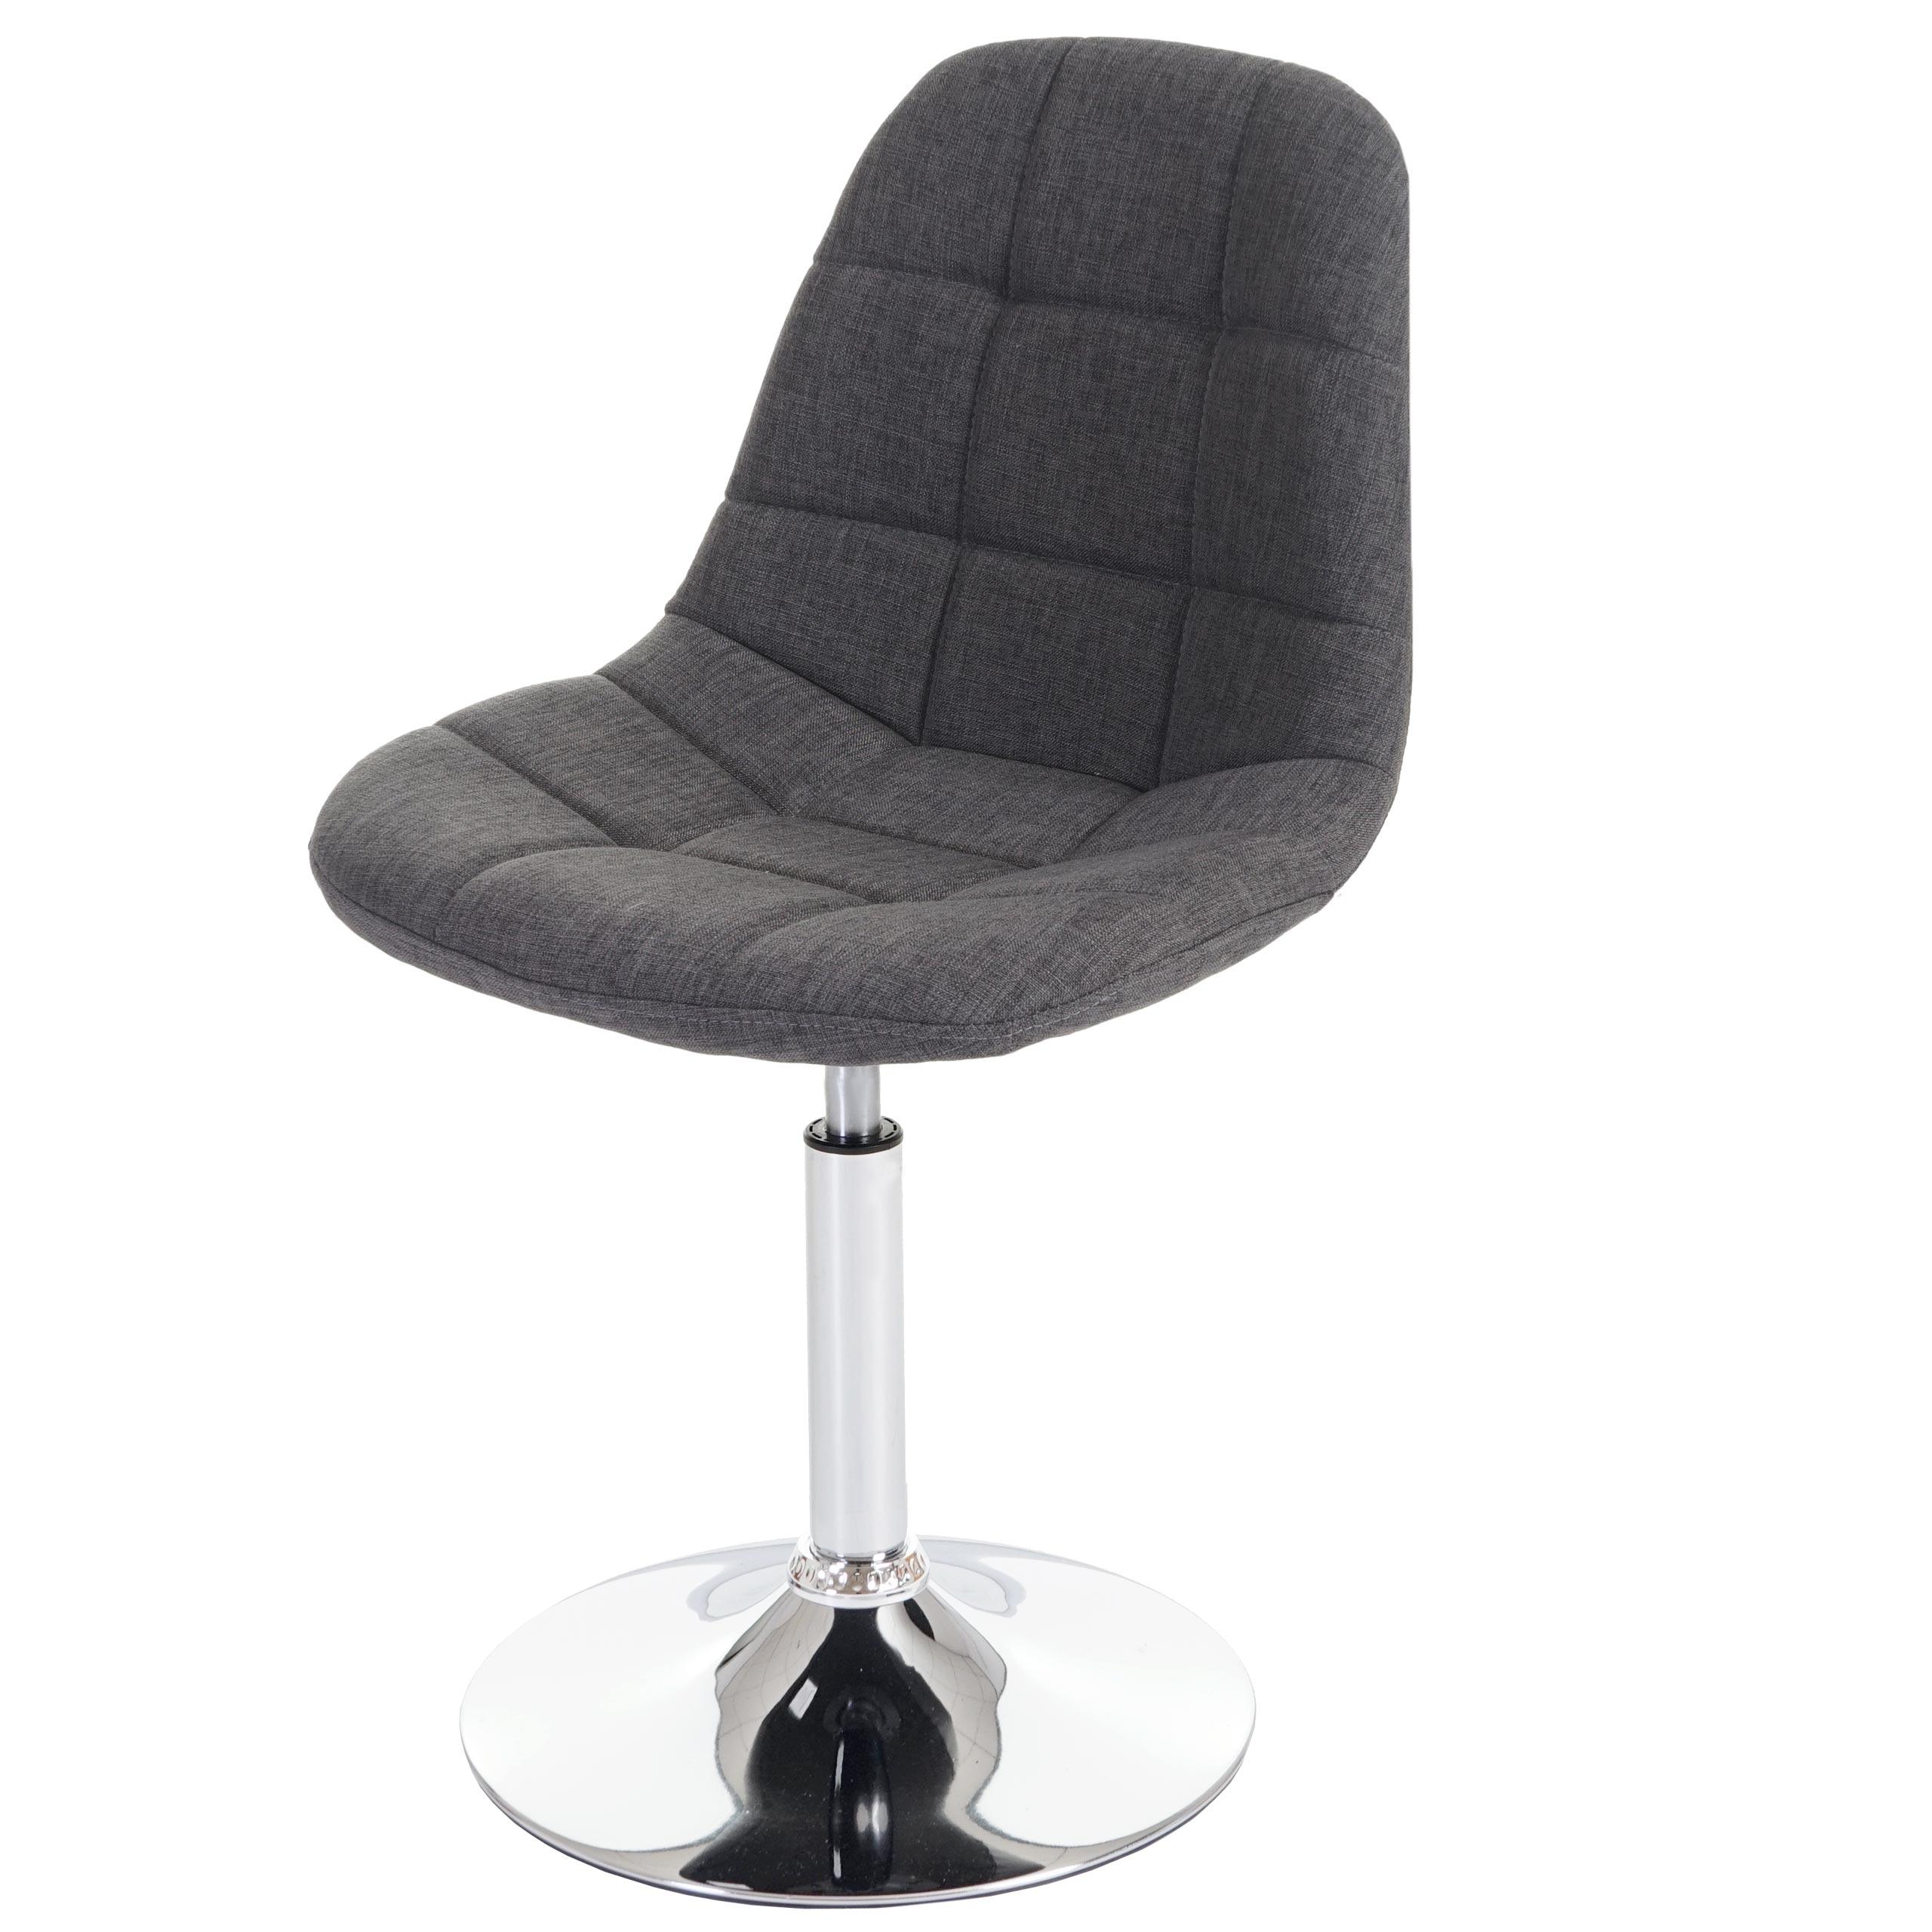 Chrom Textil Dunkelgrau 2x Esszimmerstuhl MCW-A60 Drehstuhl Stuhl